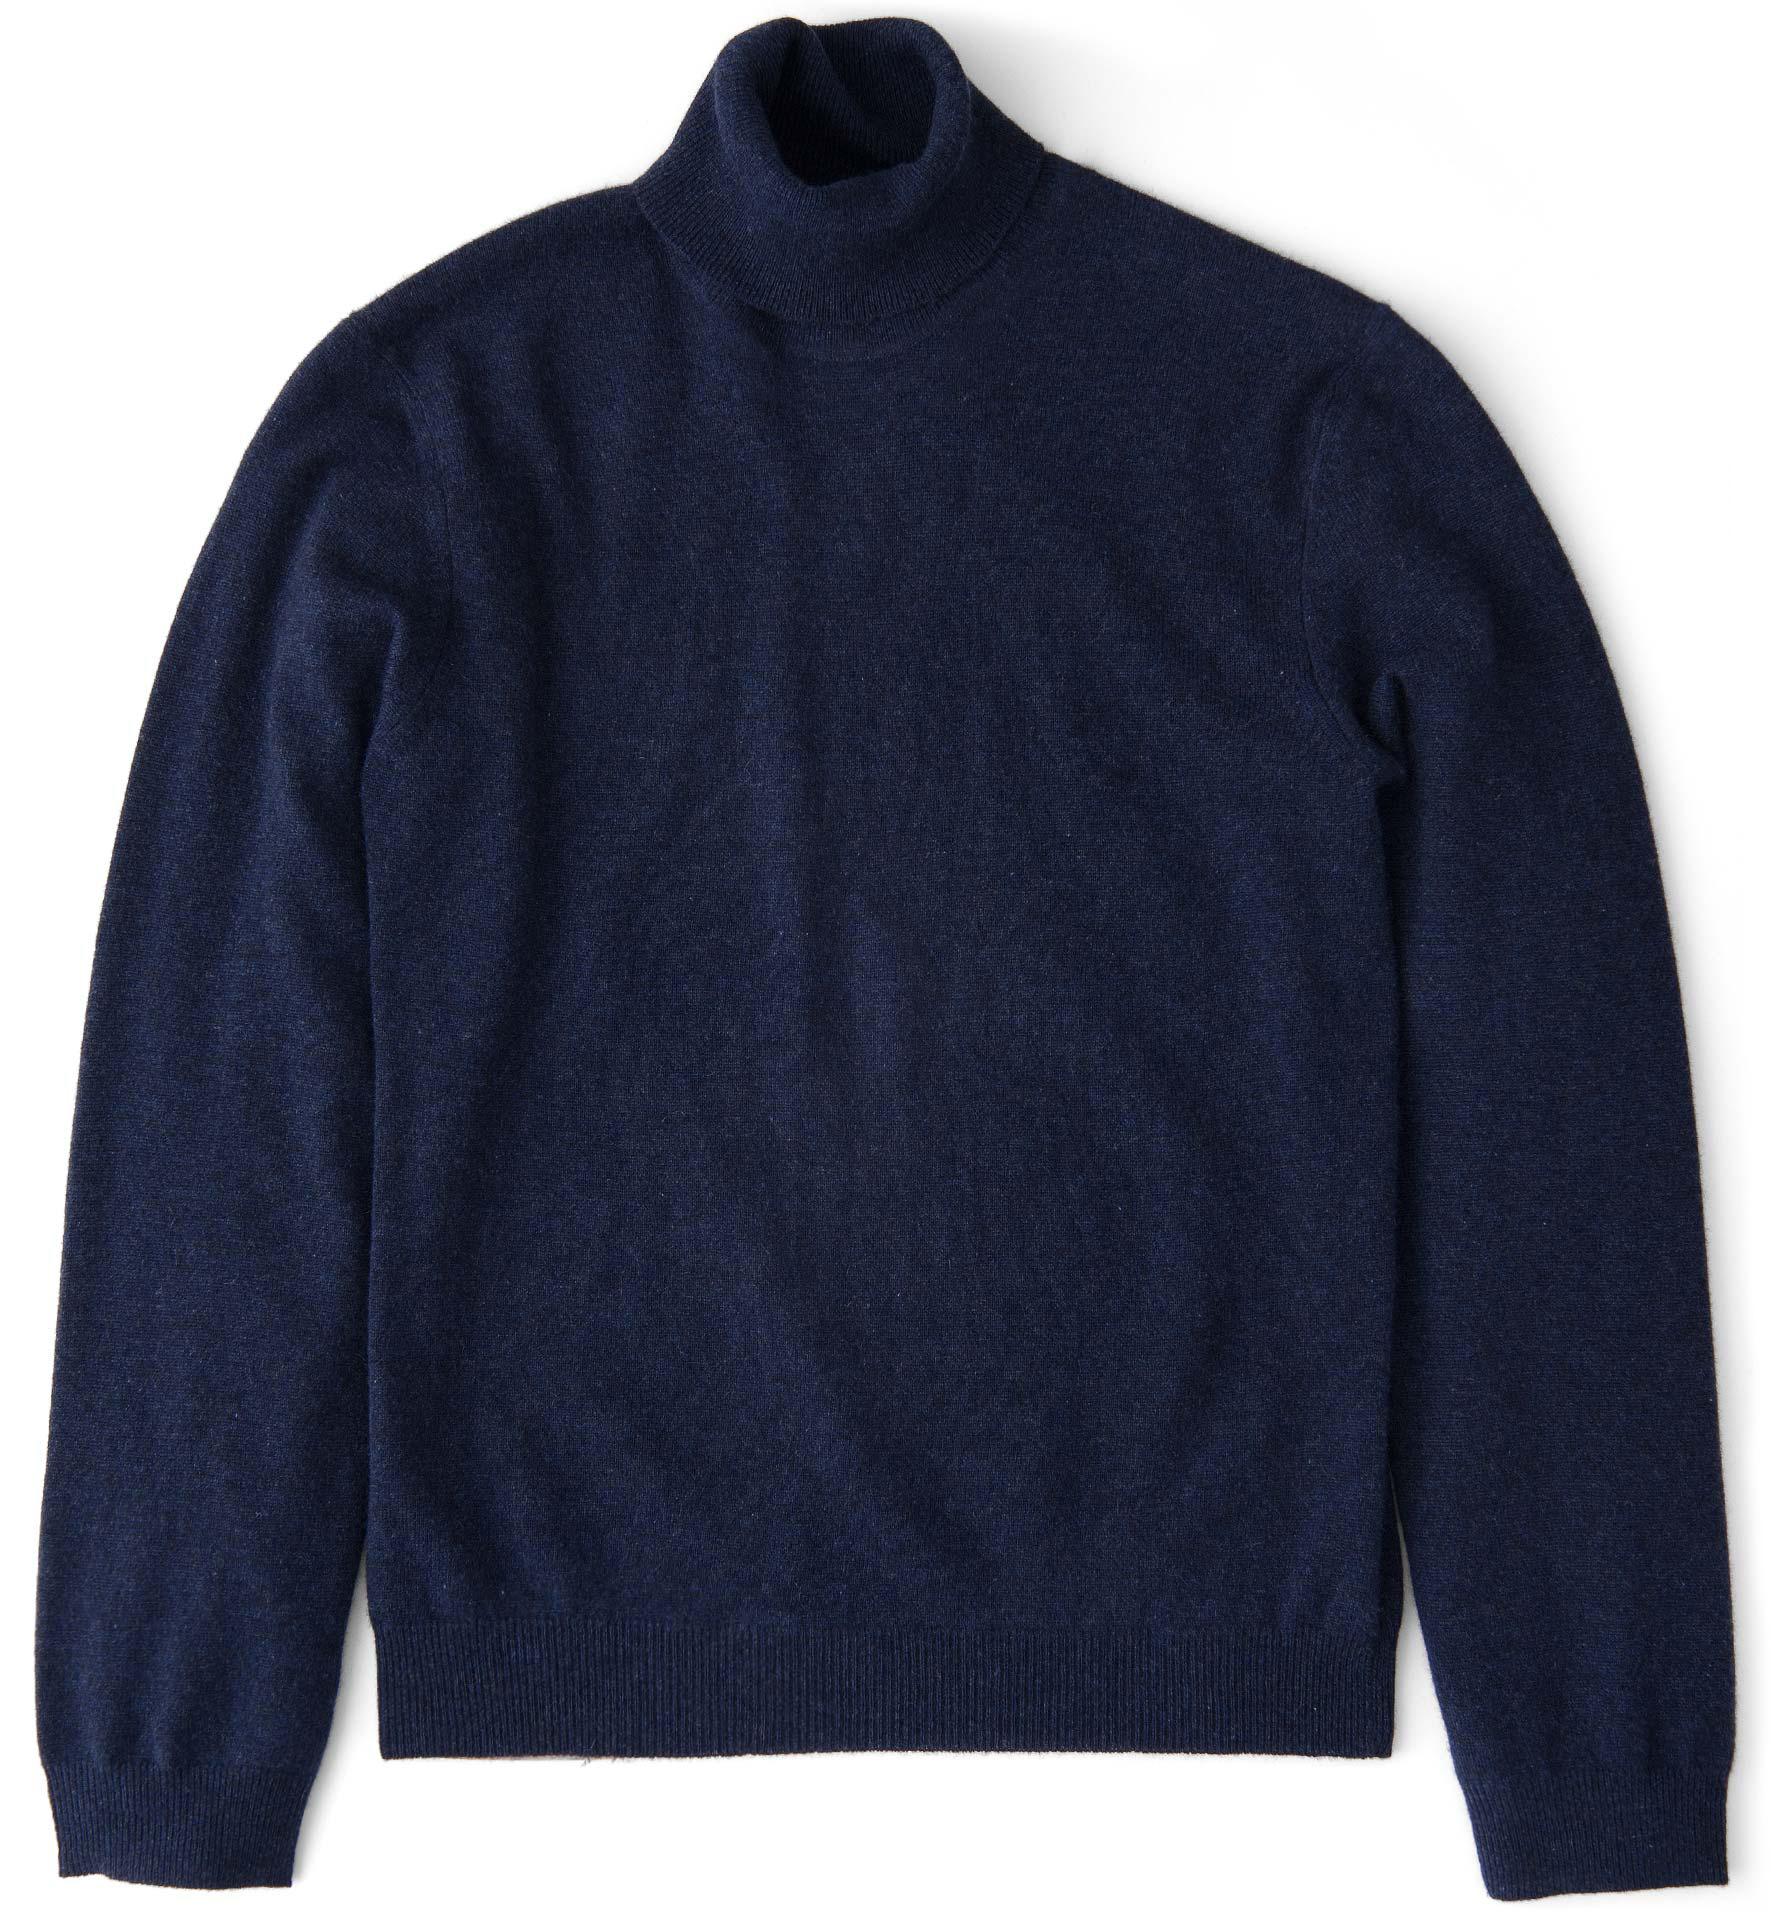 Zoom Image of Navy Melange Cashmere Turtleneck Sweater